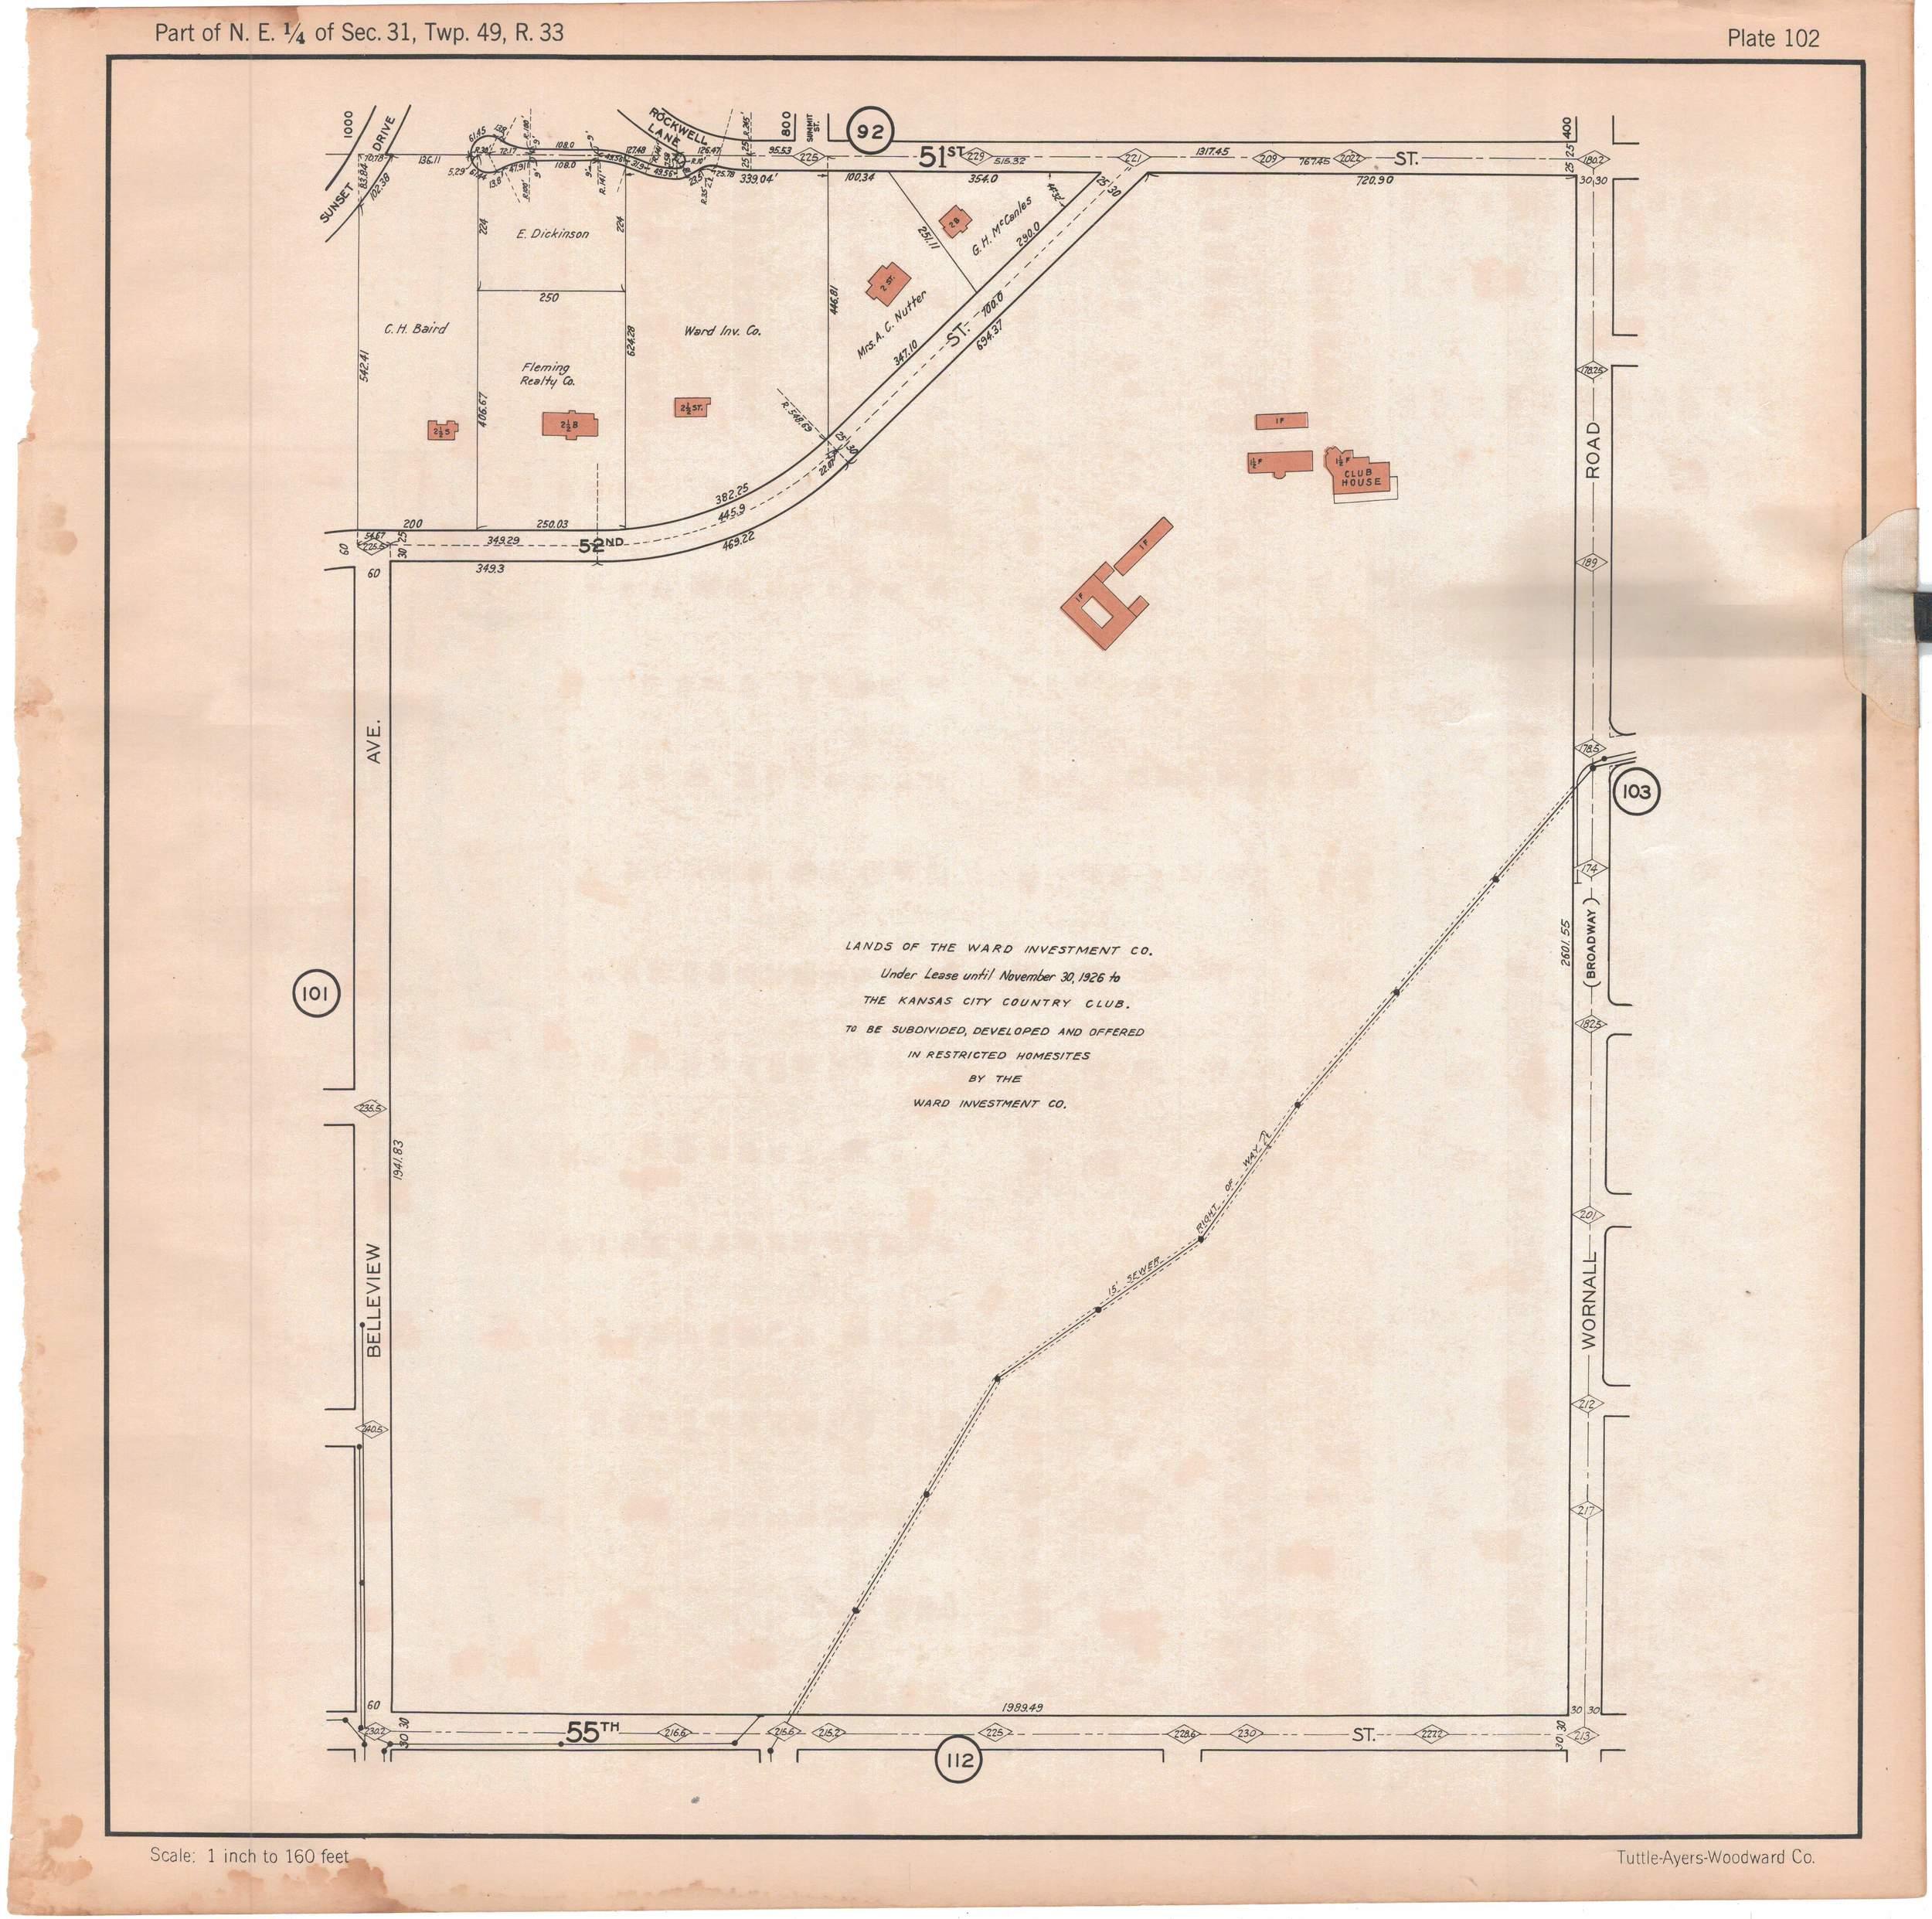 1925 TUTTLE_AYERS_Plate 102.JPG